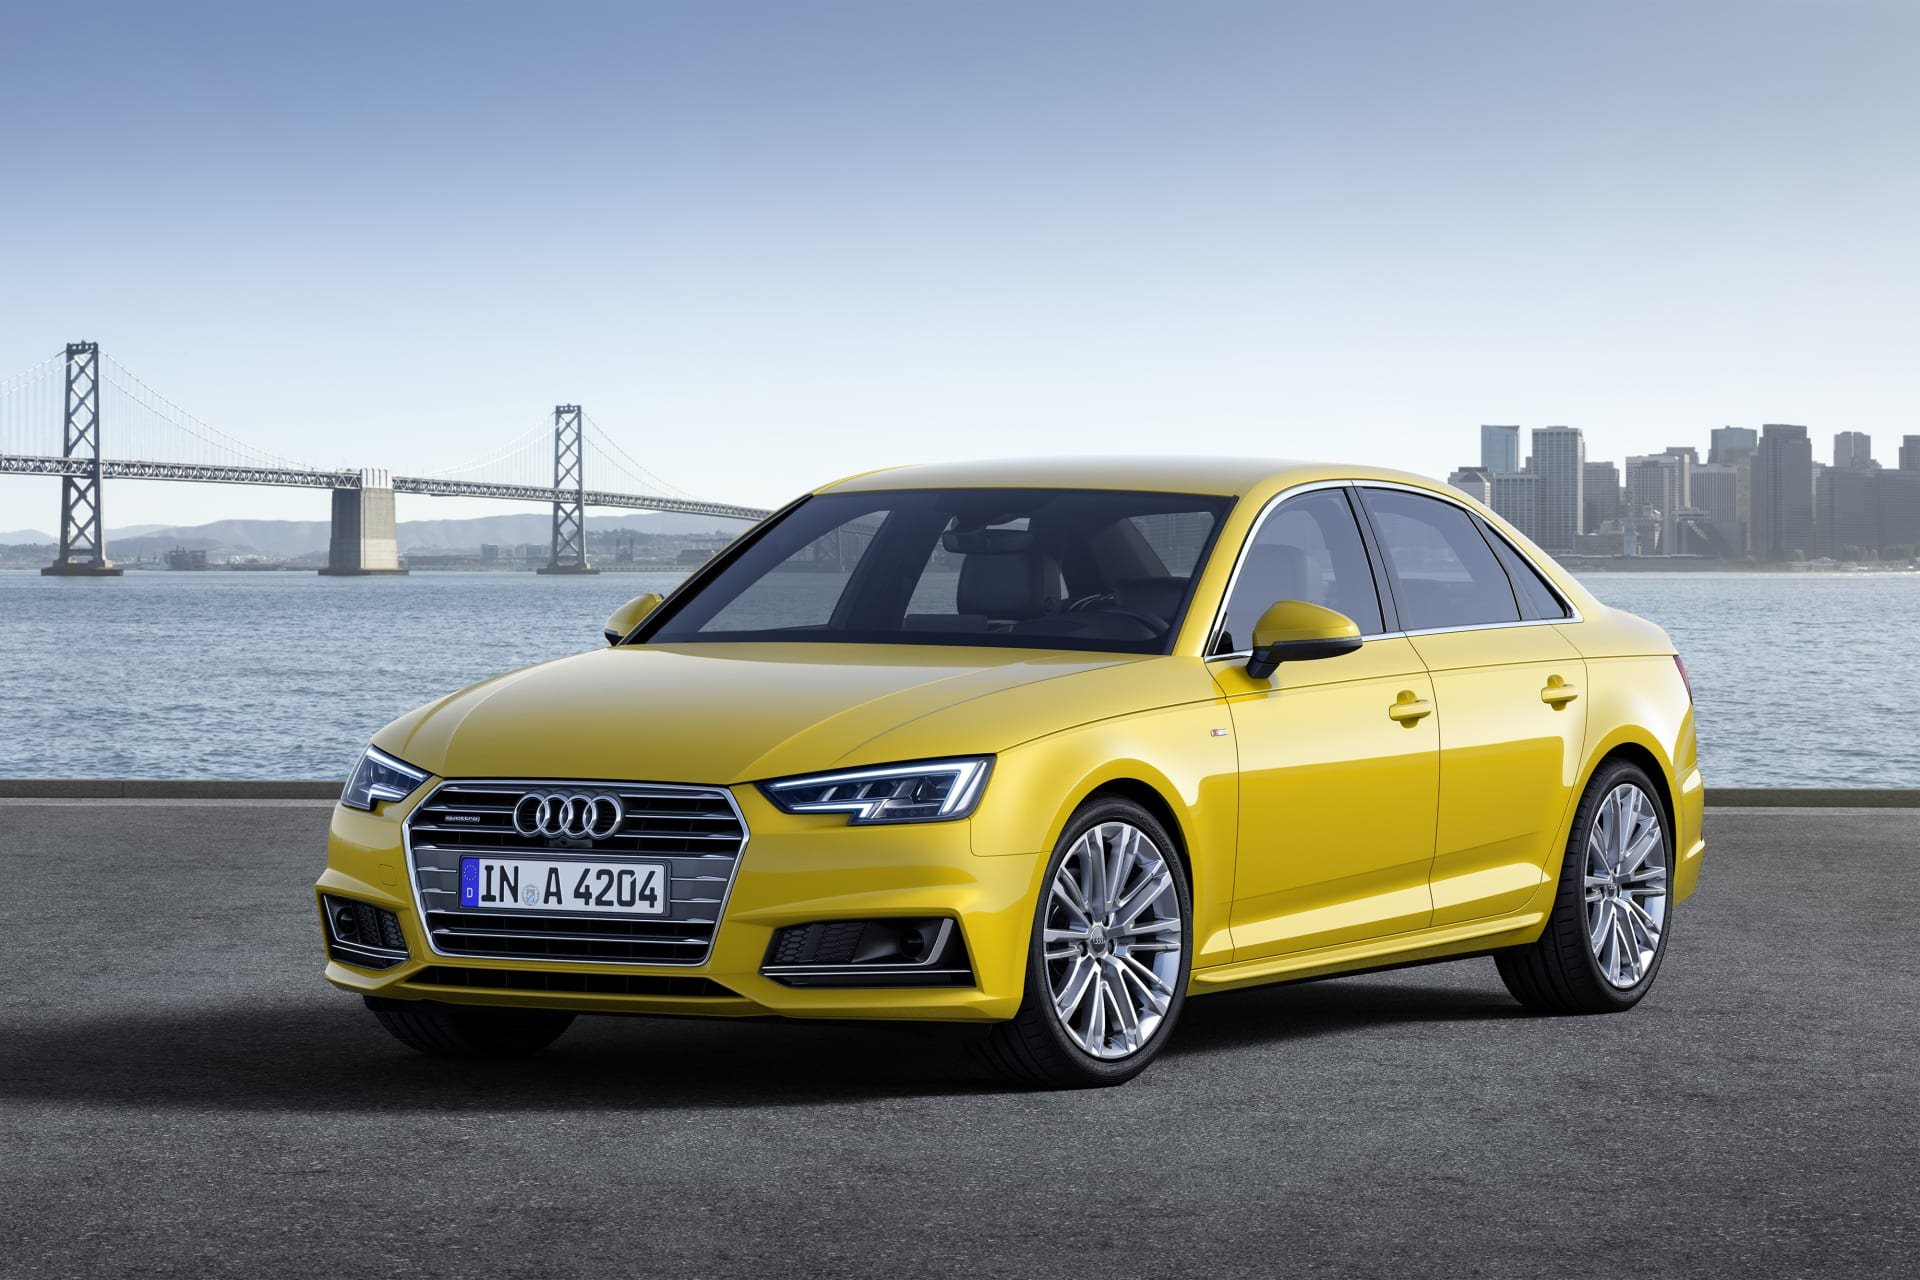 New 2019 Audi A4 2.0T quattro Premium 2.0T quattro Premium for sale $42,000 at M and V Leasing in Brooklyn NY 11223 1